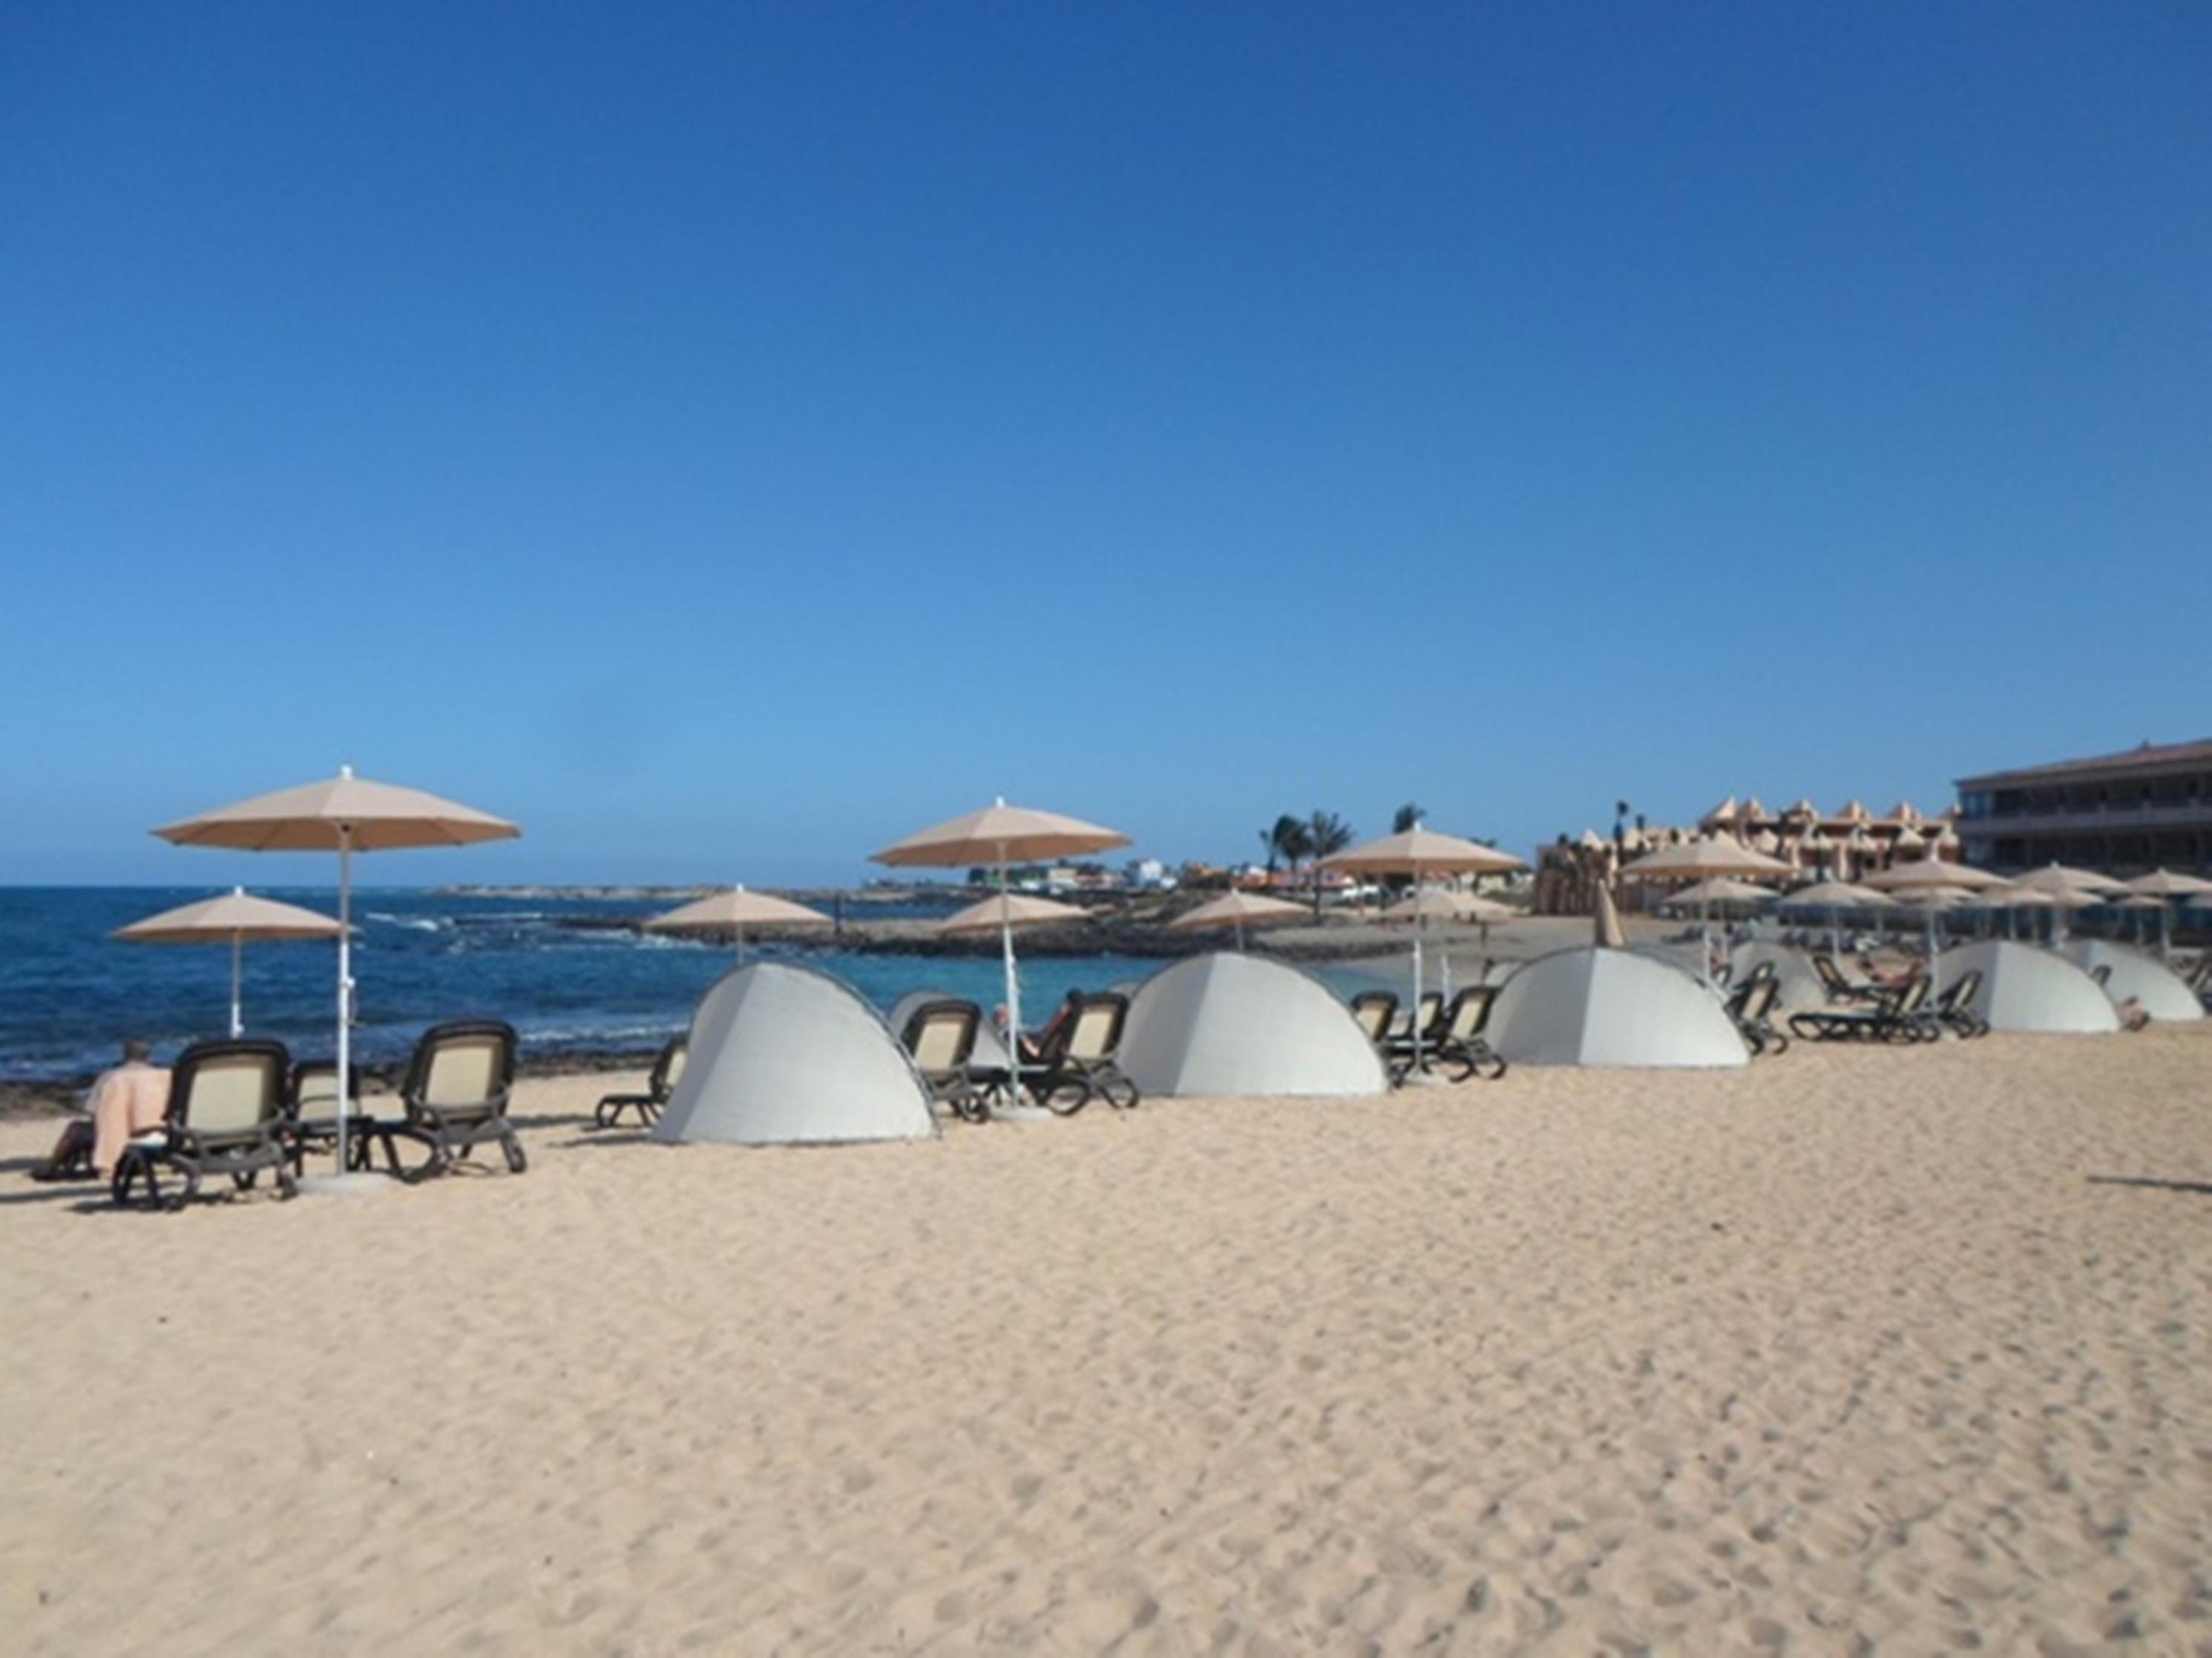 Ferienwohnung Wohnung El Mirador -Residencial Las Dunas - (2196686), Corralejo, Fuerteventura, Kanarische Inseln, Spanien, Bild 19